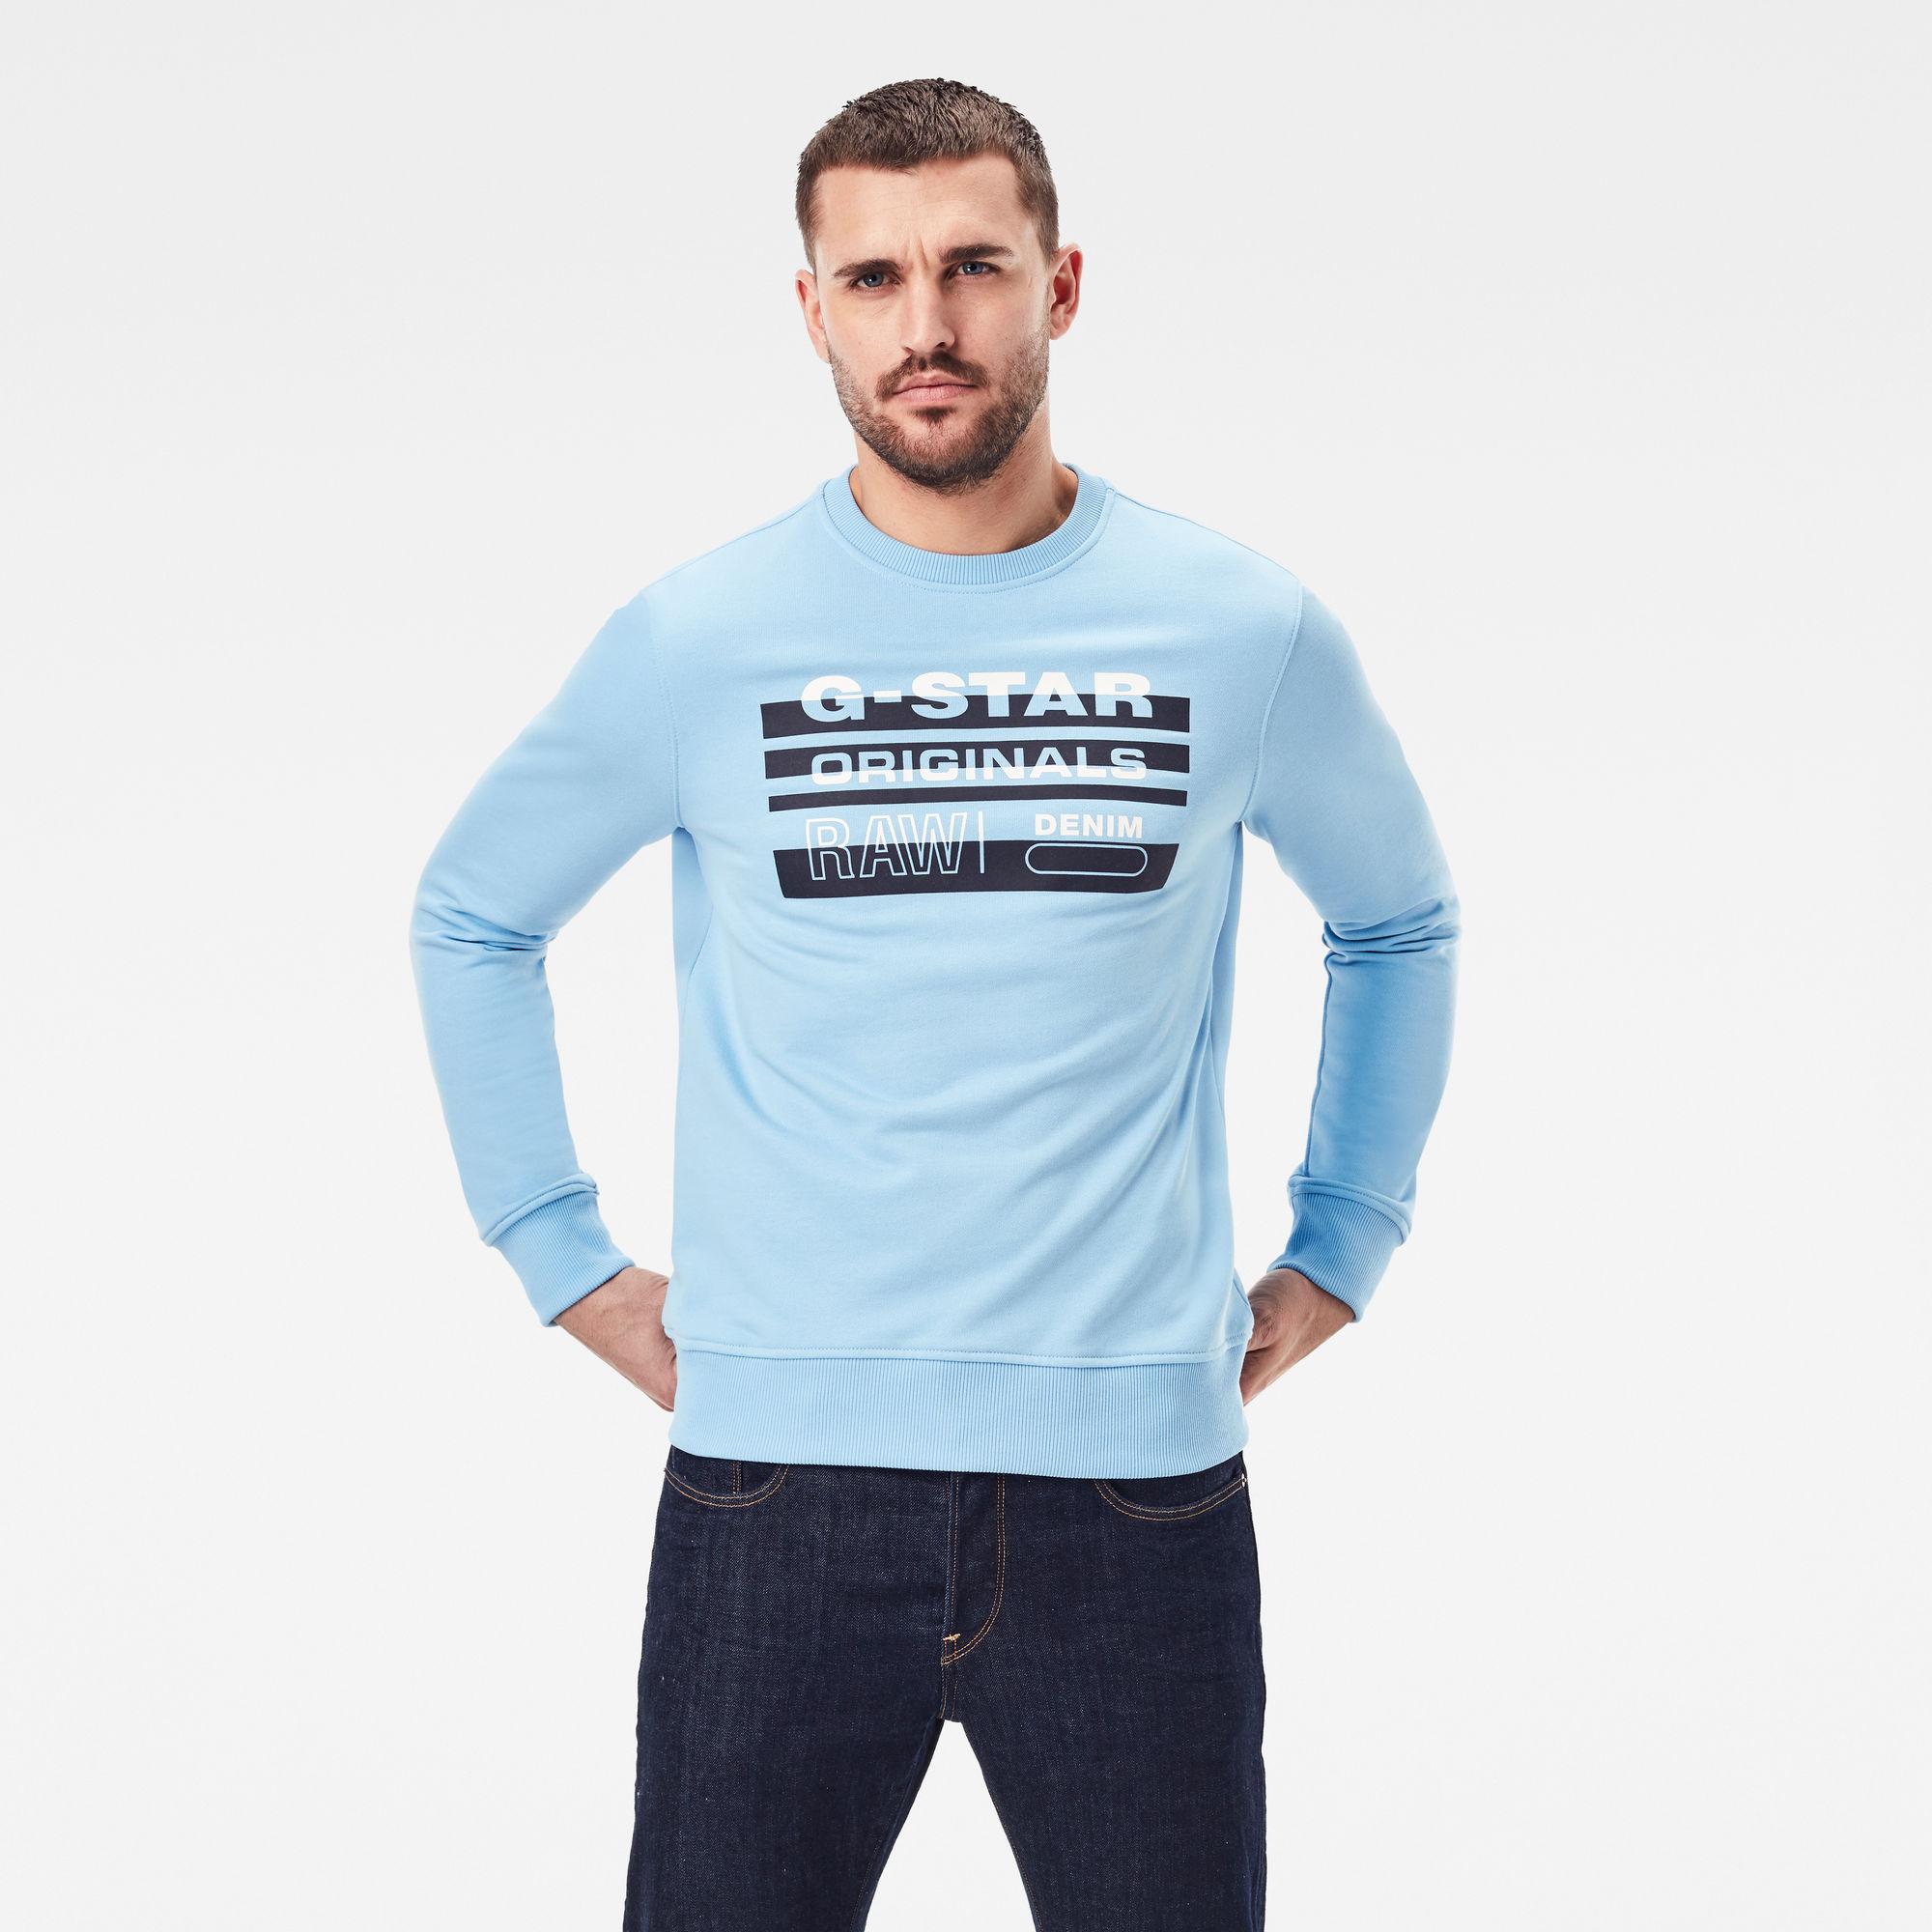 G-Star RAW Heren Originals Sweater Blauw